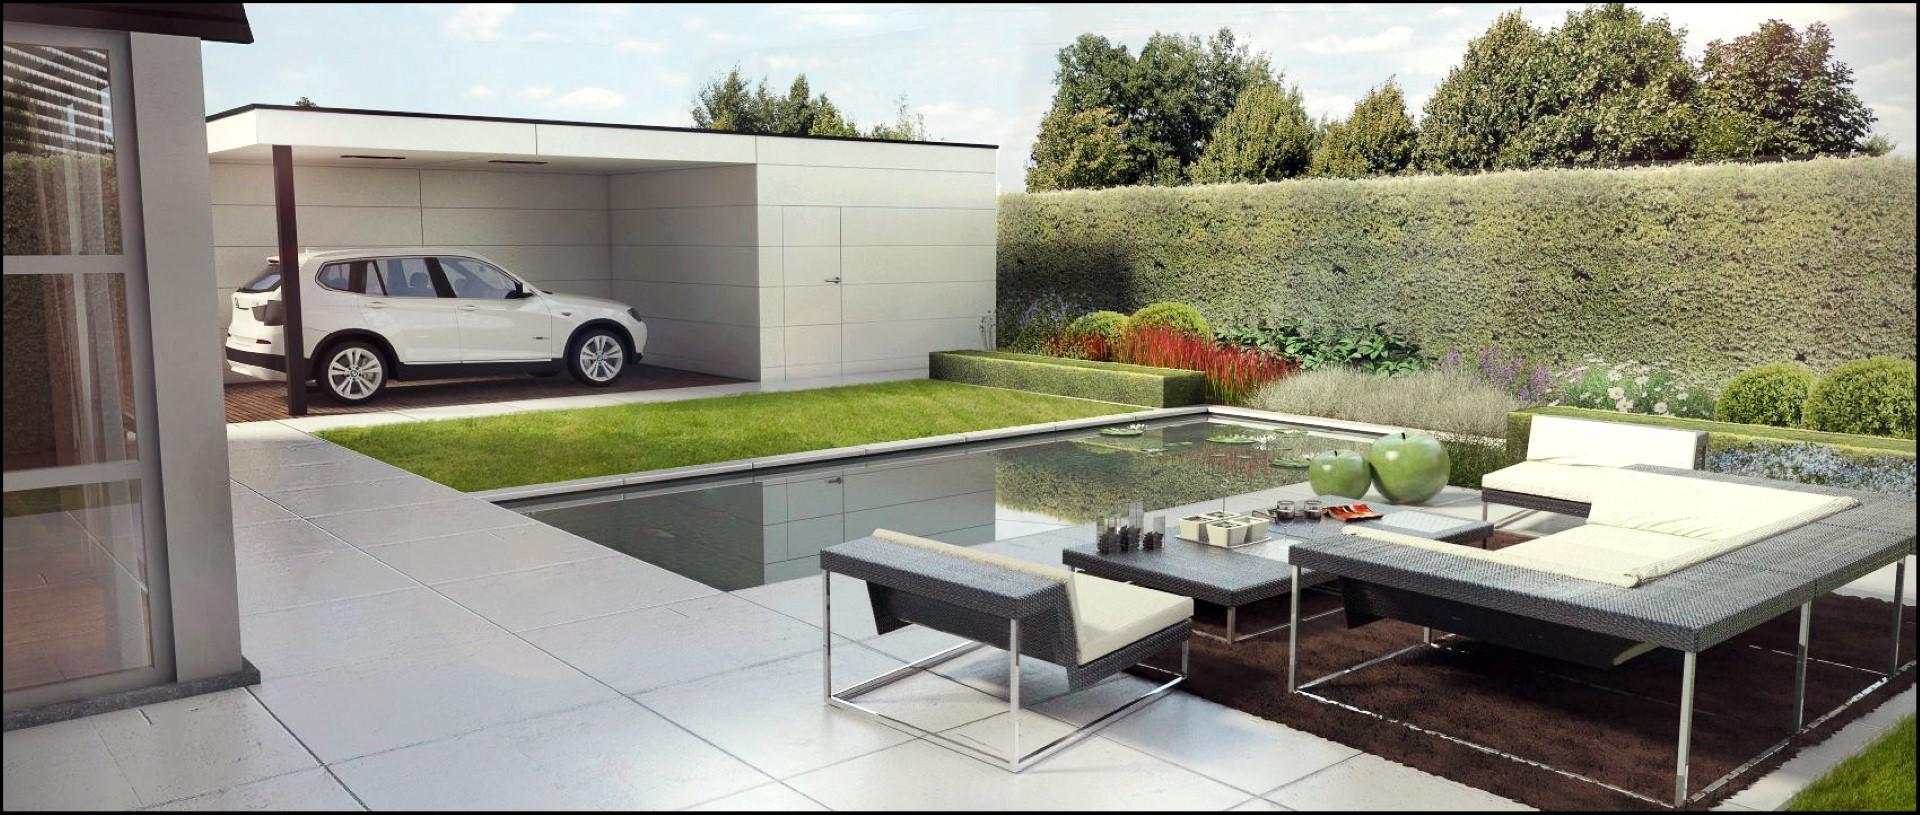 Extreem ECO Tuinarchitectengroep | 3D projecten | Moderne tuin Zottegem #QK94